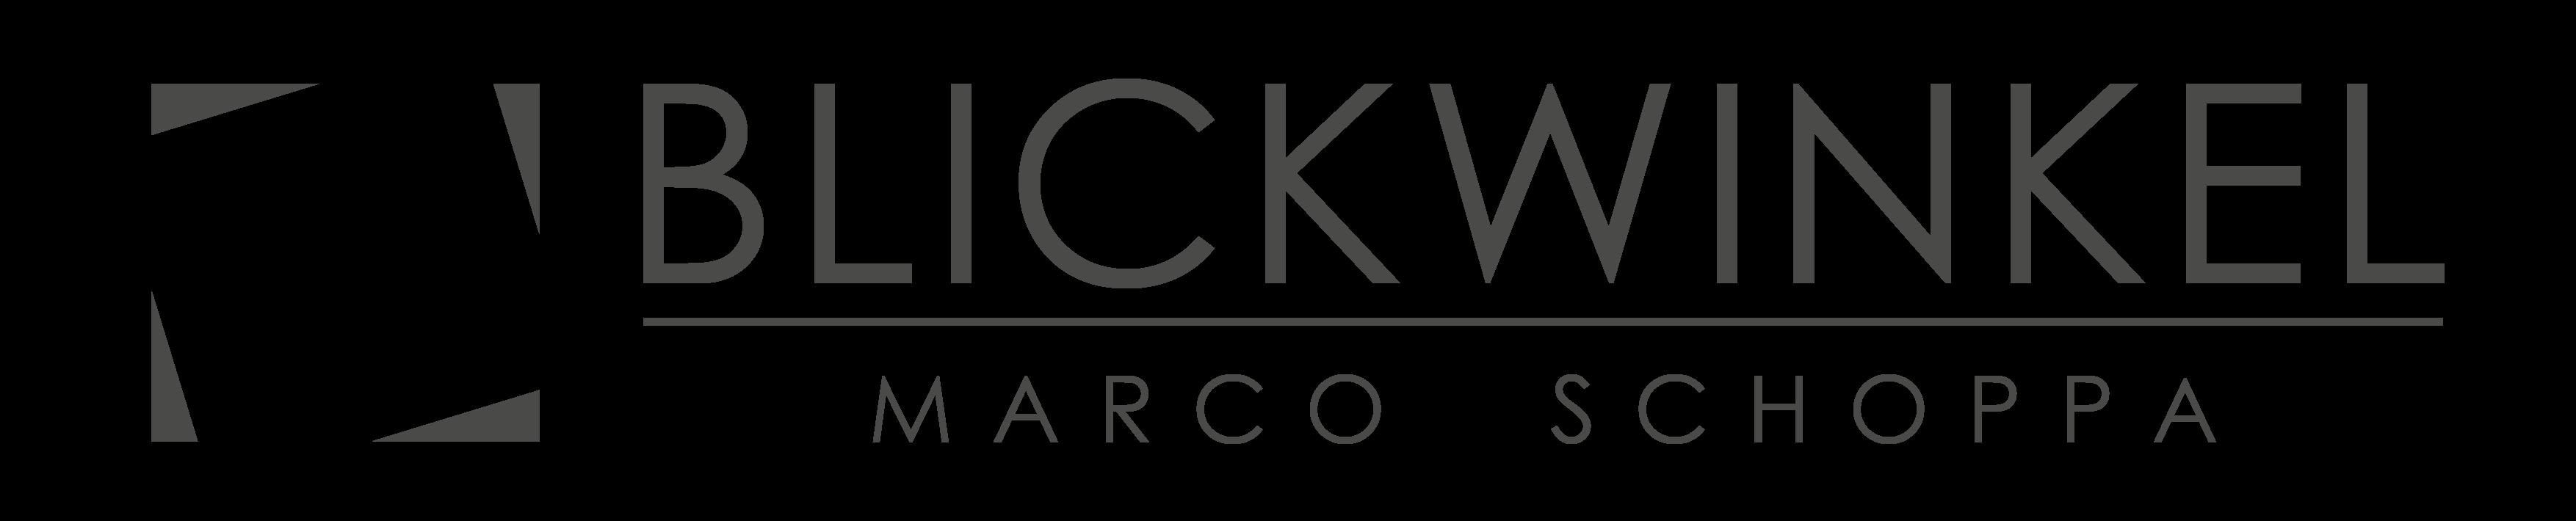 Blickwinkel Shop